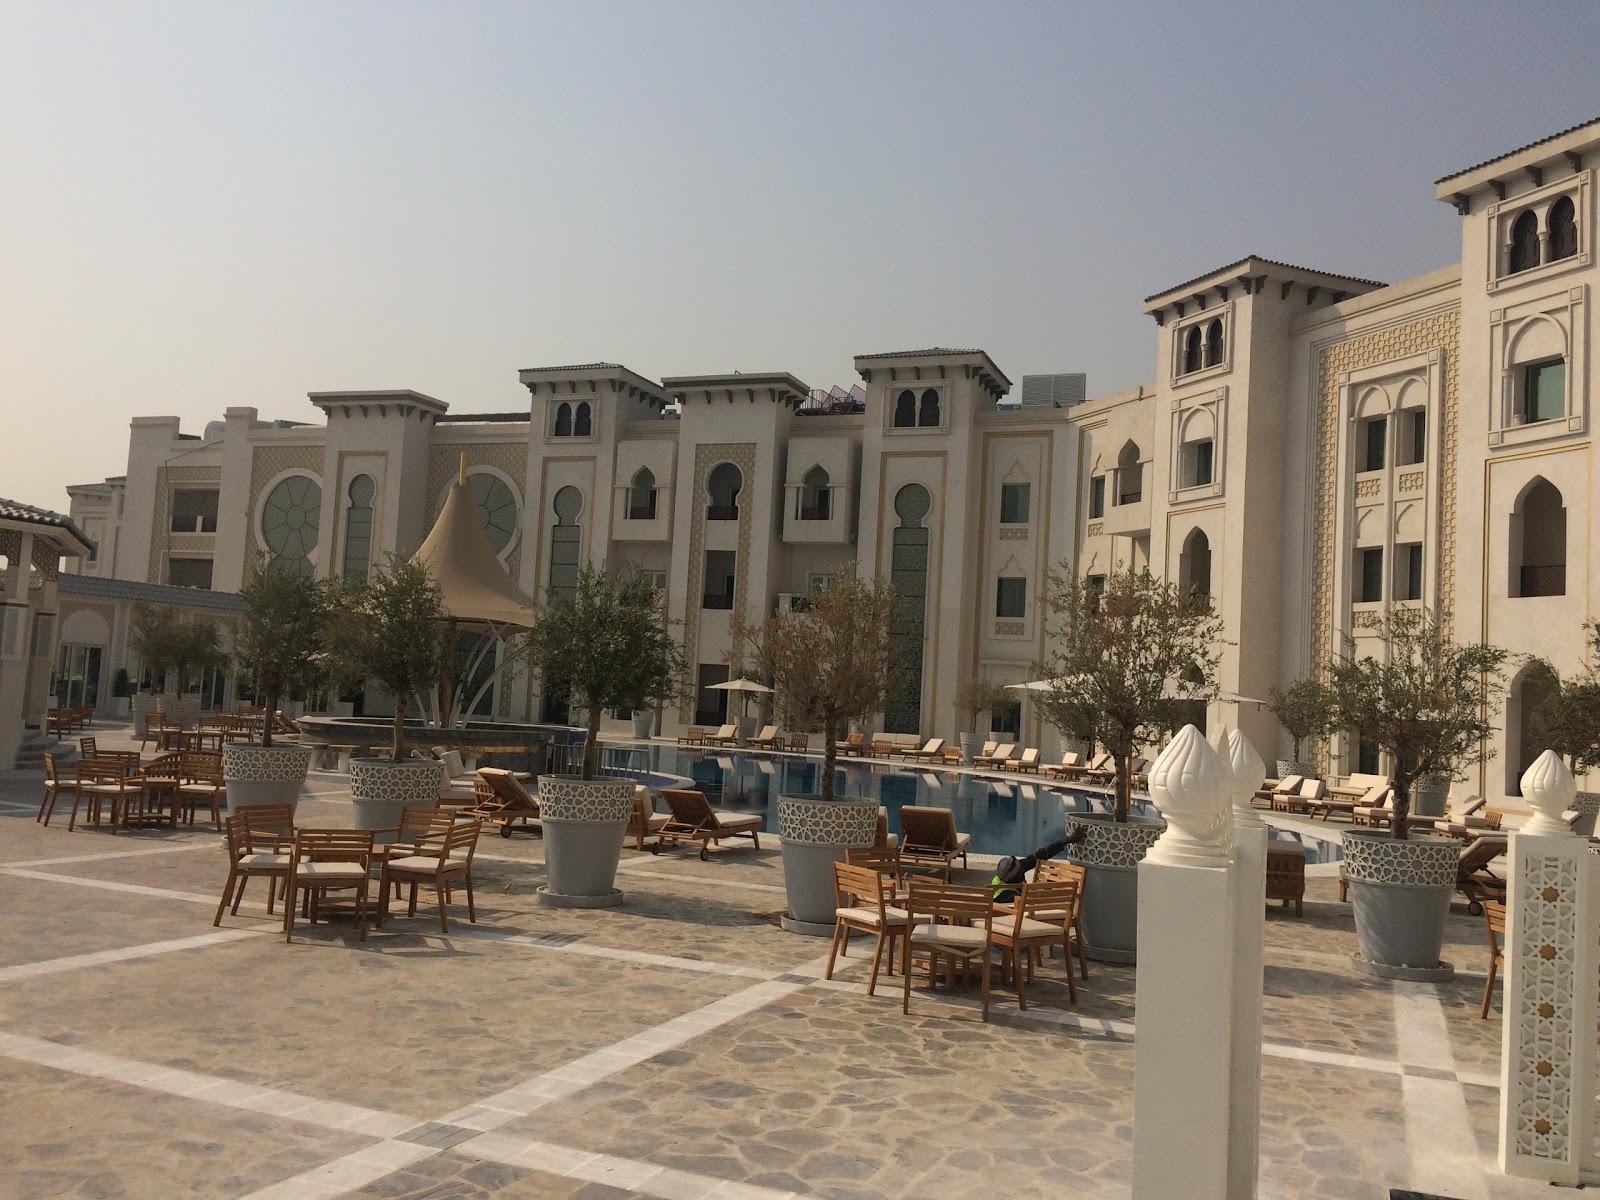 EZDAN PALACE HOTEL